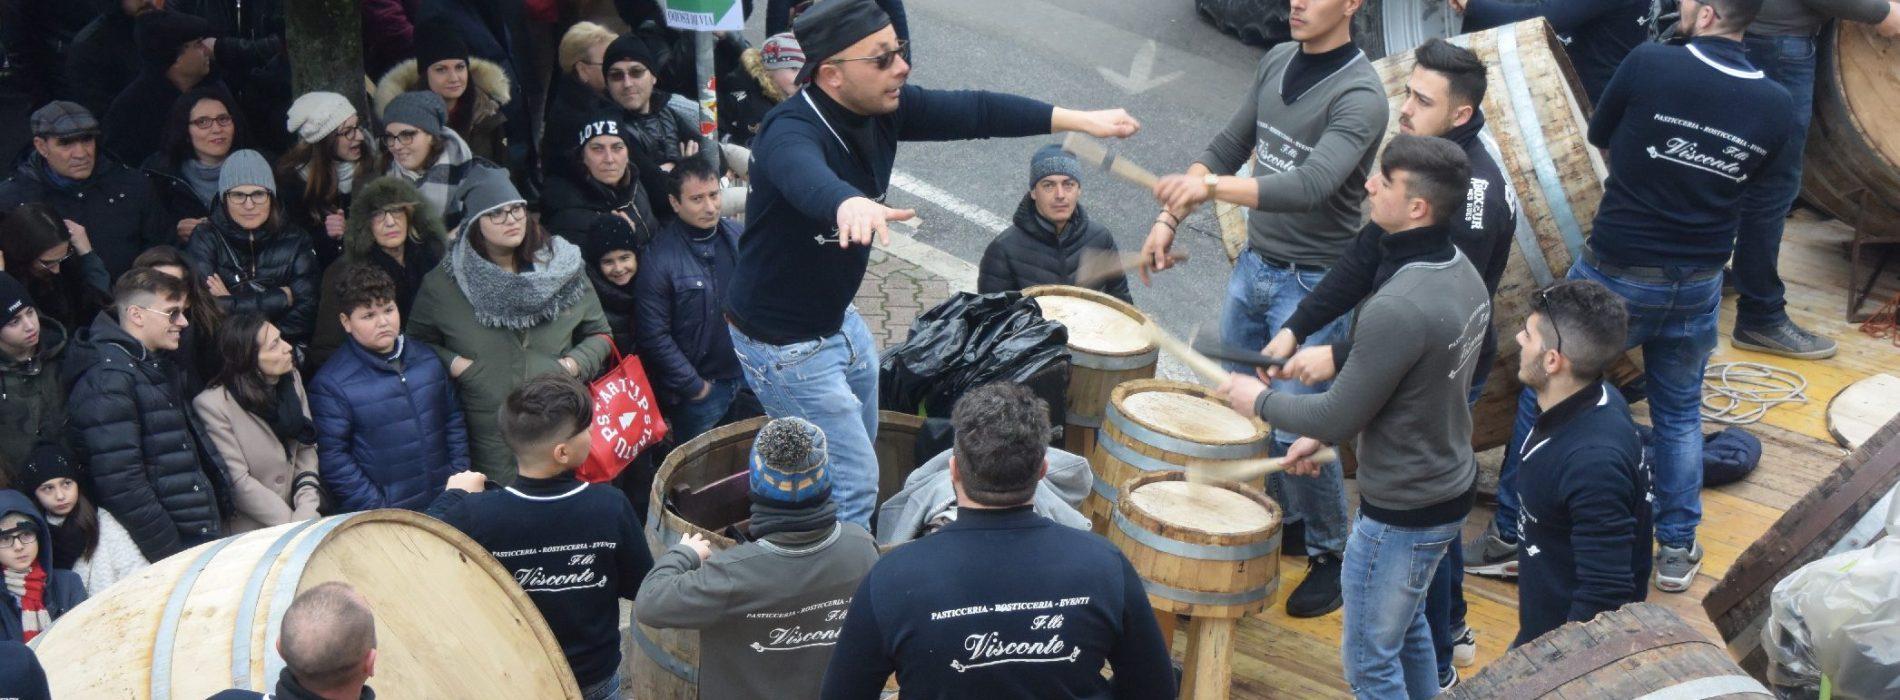 Pastellessa Folk Festival, bottari show a Macerata Campania